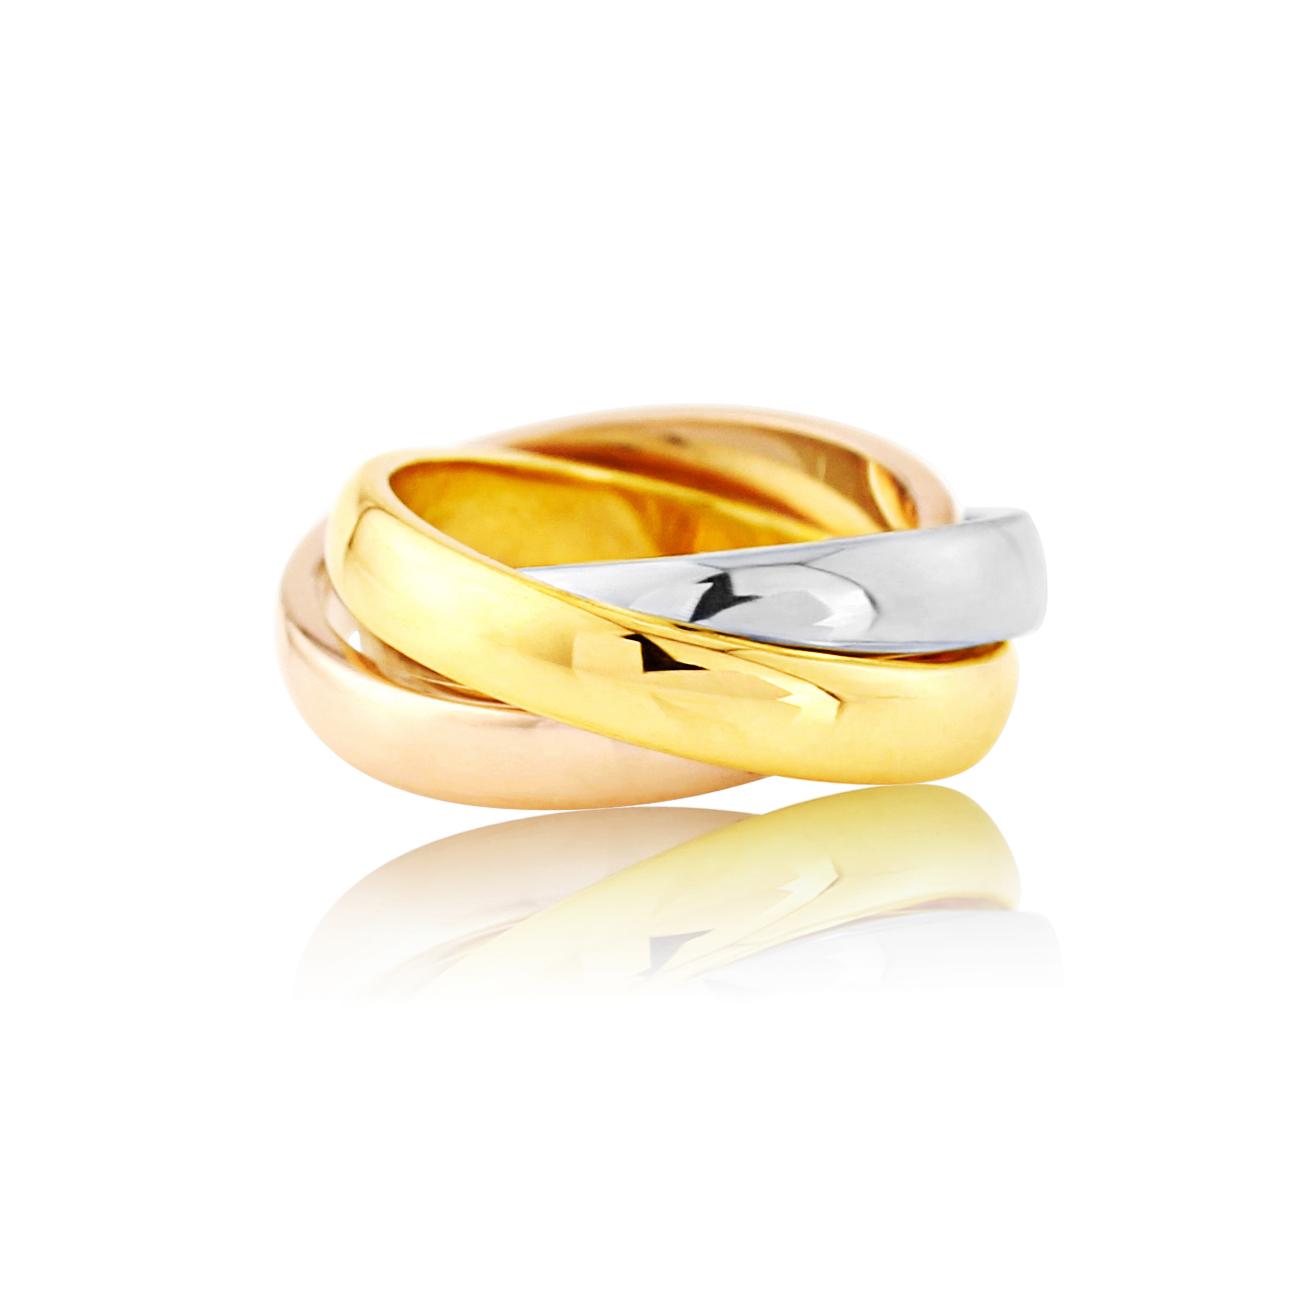 Walton Gold Russian Wedding Ring